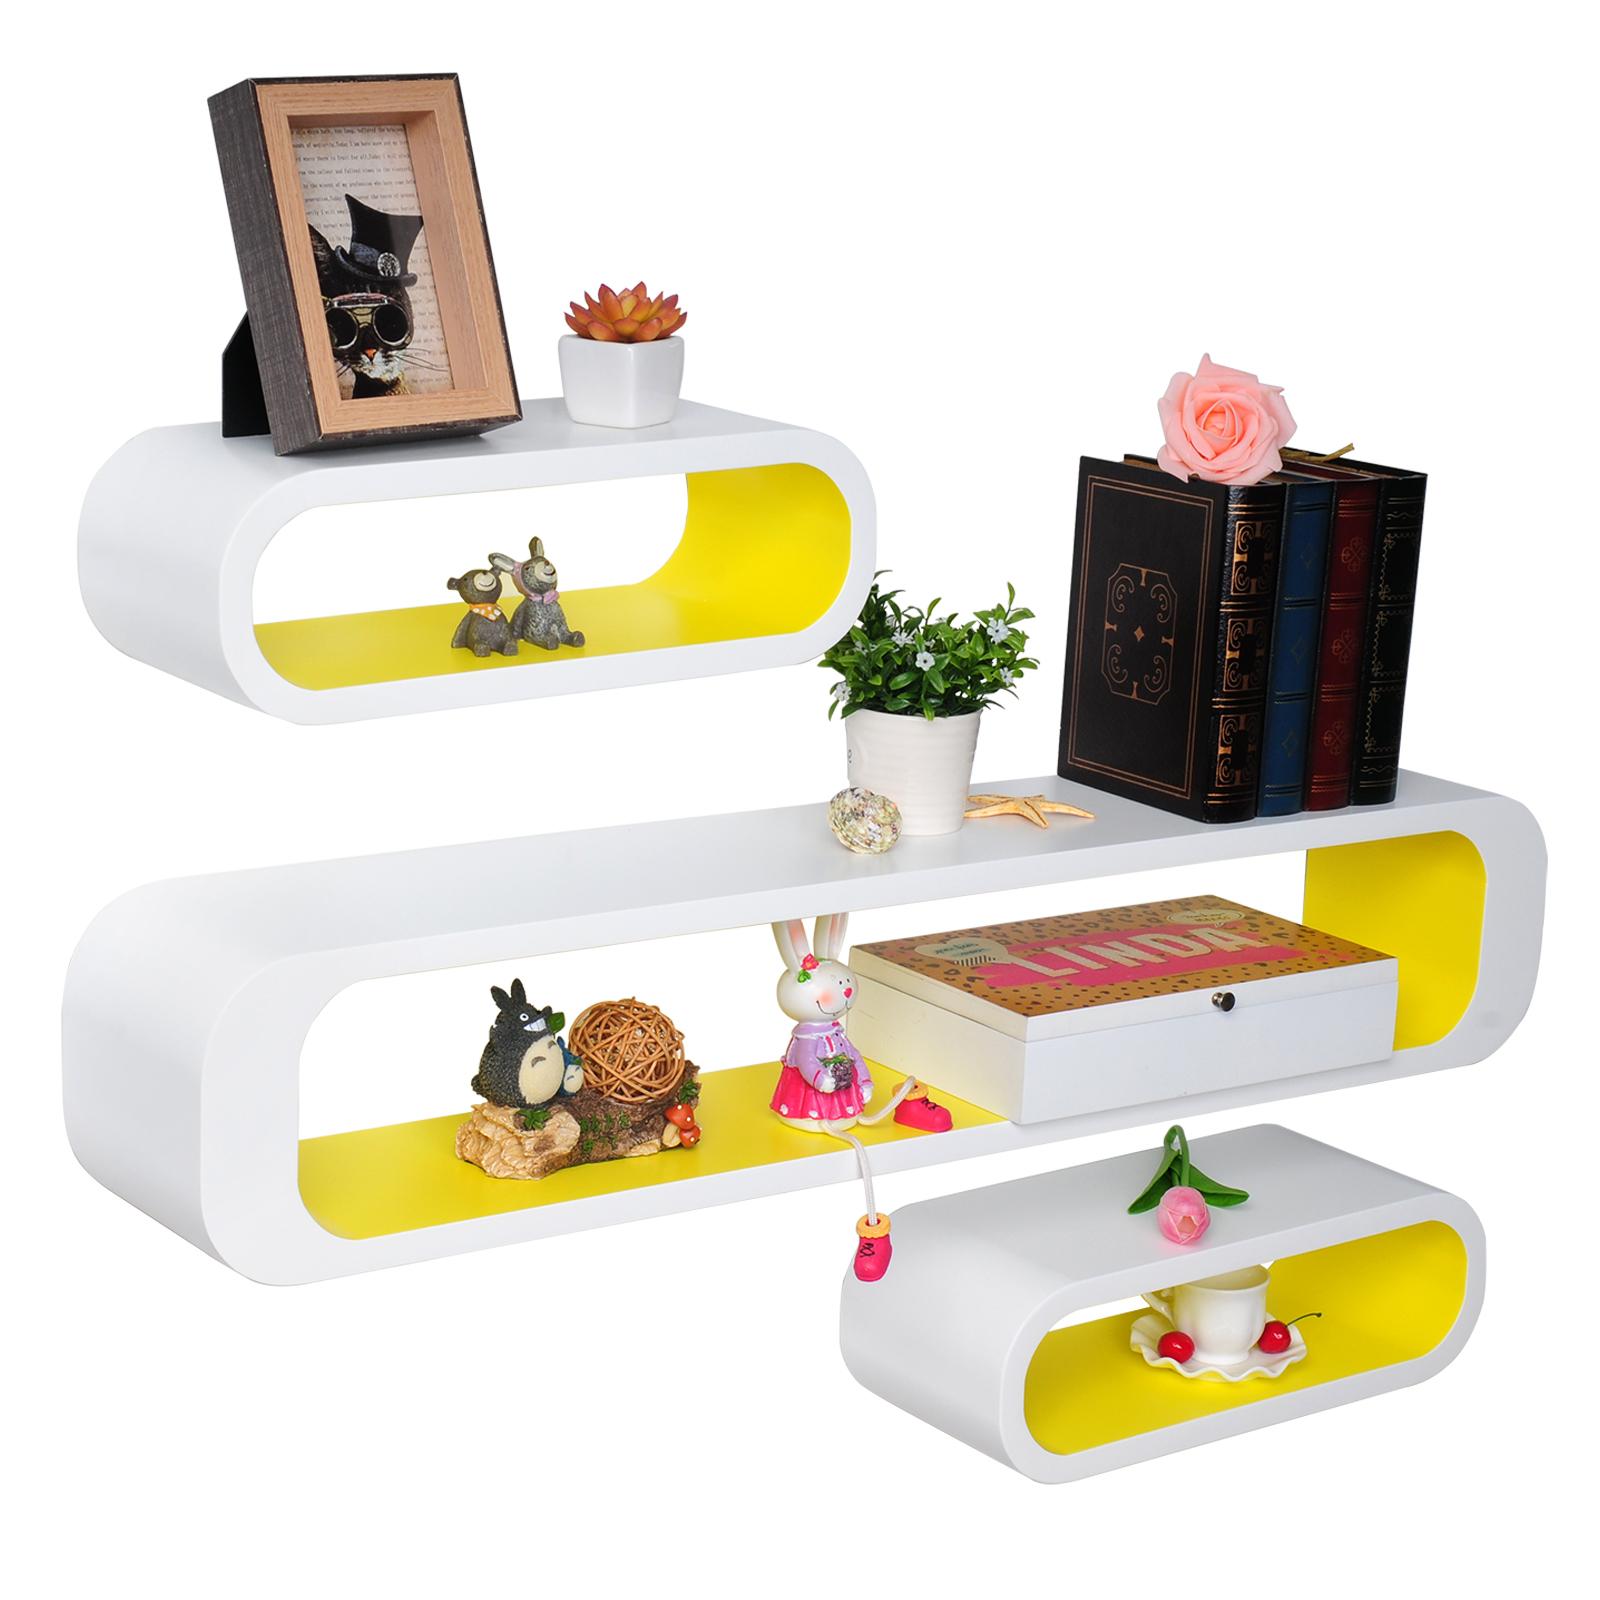 3er set wandregal b cherregal h ngeregal regal b roregal. Black Bedroom Furniture Sets. Home Design Ideas